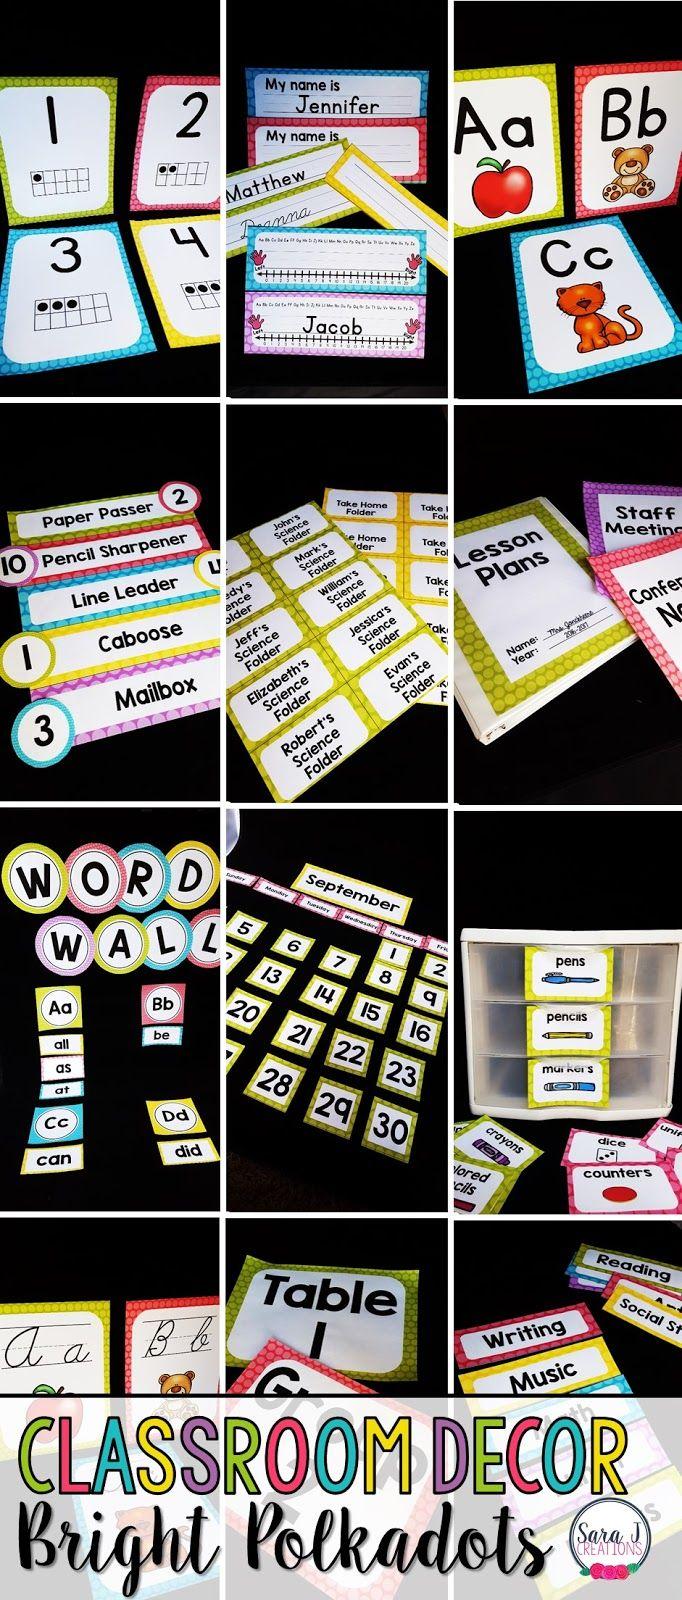 Classroom Decor - Bright Polkadot Fun! #elementaryclassroomdecor